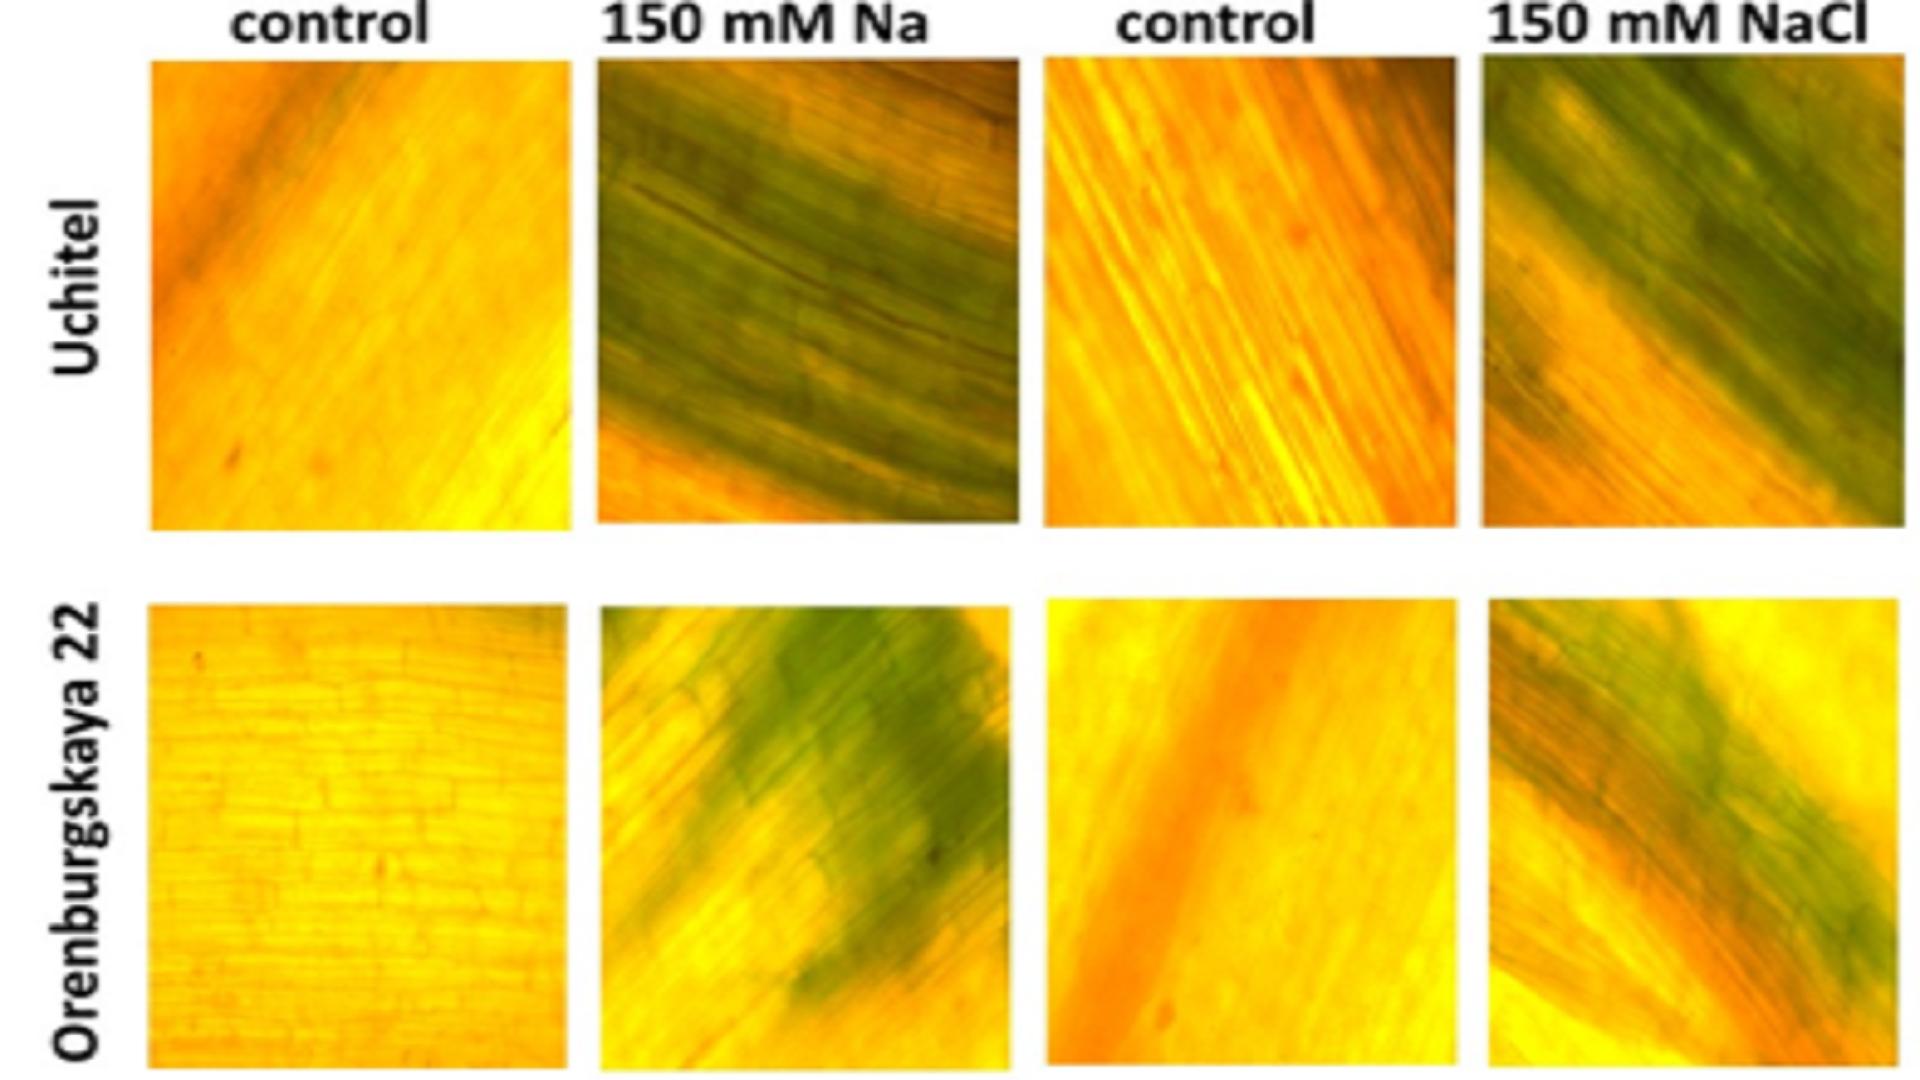 Salt Tolerance of Wheat (Triticum Aestivum) Varieties Grown Under Laboratory and Field Conditions